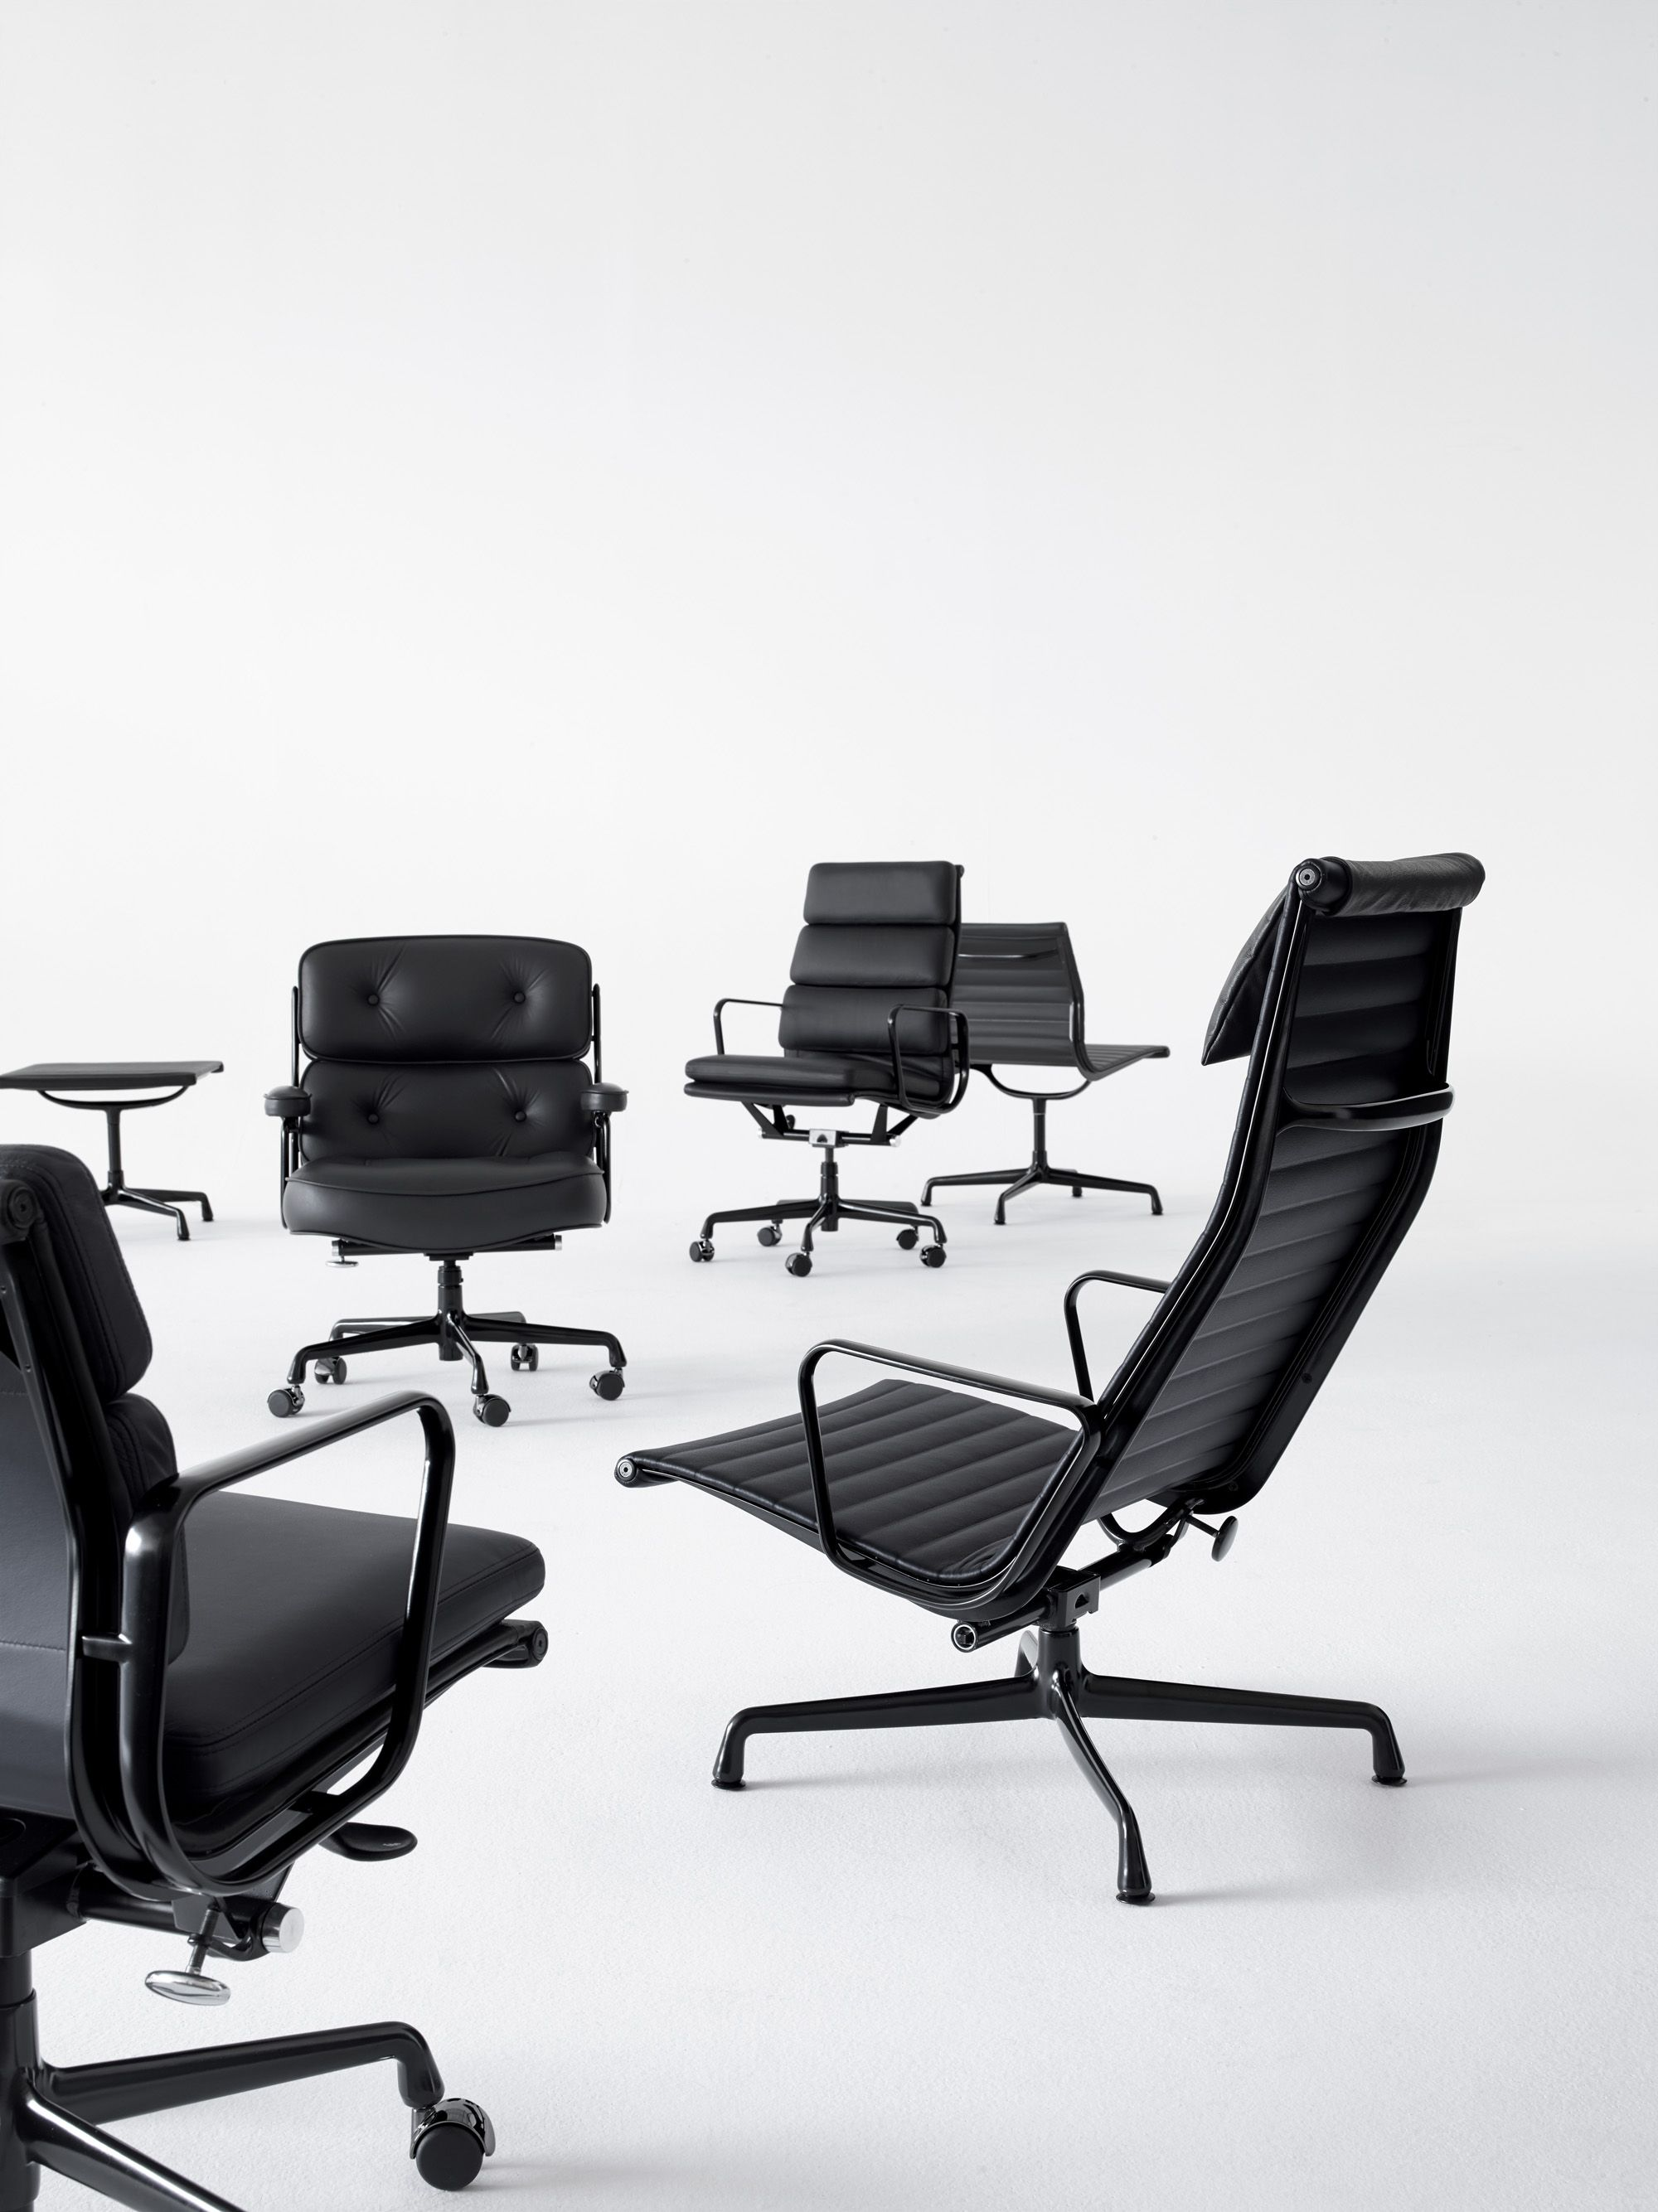 Eames In Black Pin It Design Mundodascasas See More Here Www Mundodascasas Com Br Eames Office Chair Office Chair Design Chair Design